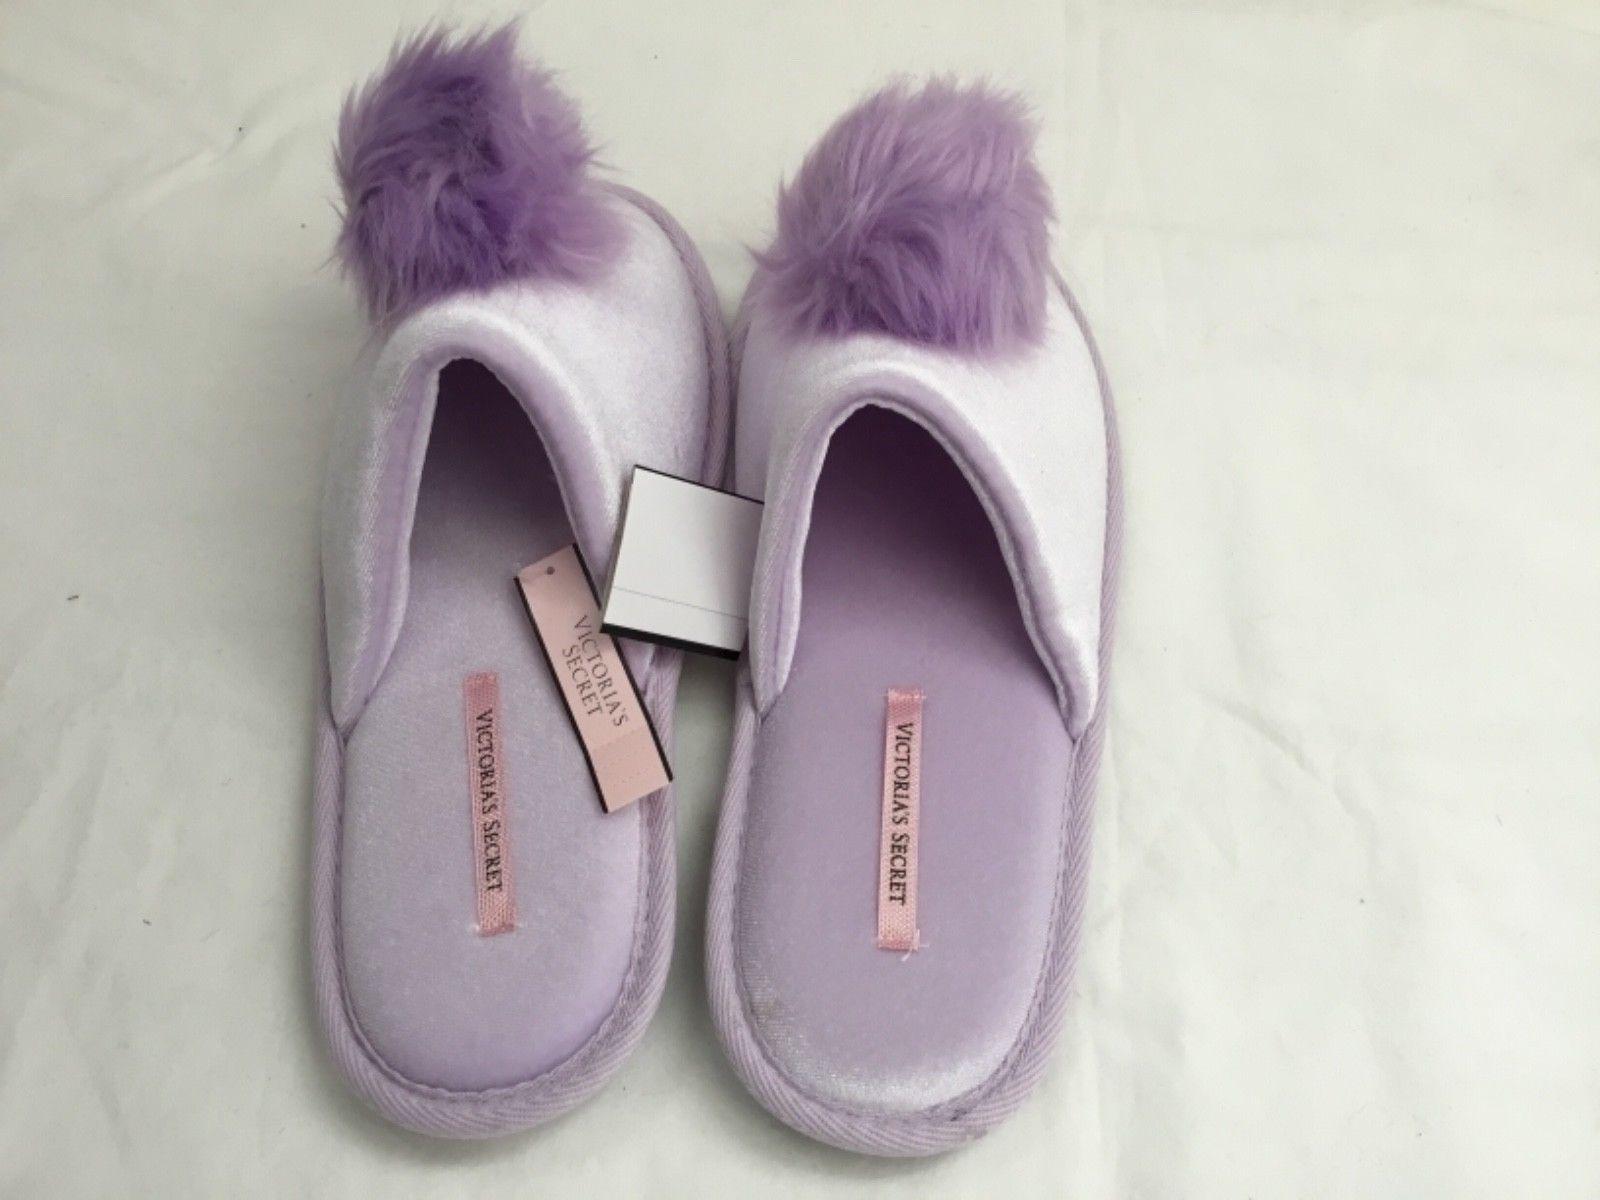 Victoria's Secret  Womens Dreamy Lavendar Pom Pom Velvet Slippers Size M(7-8) image 2